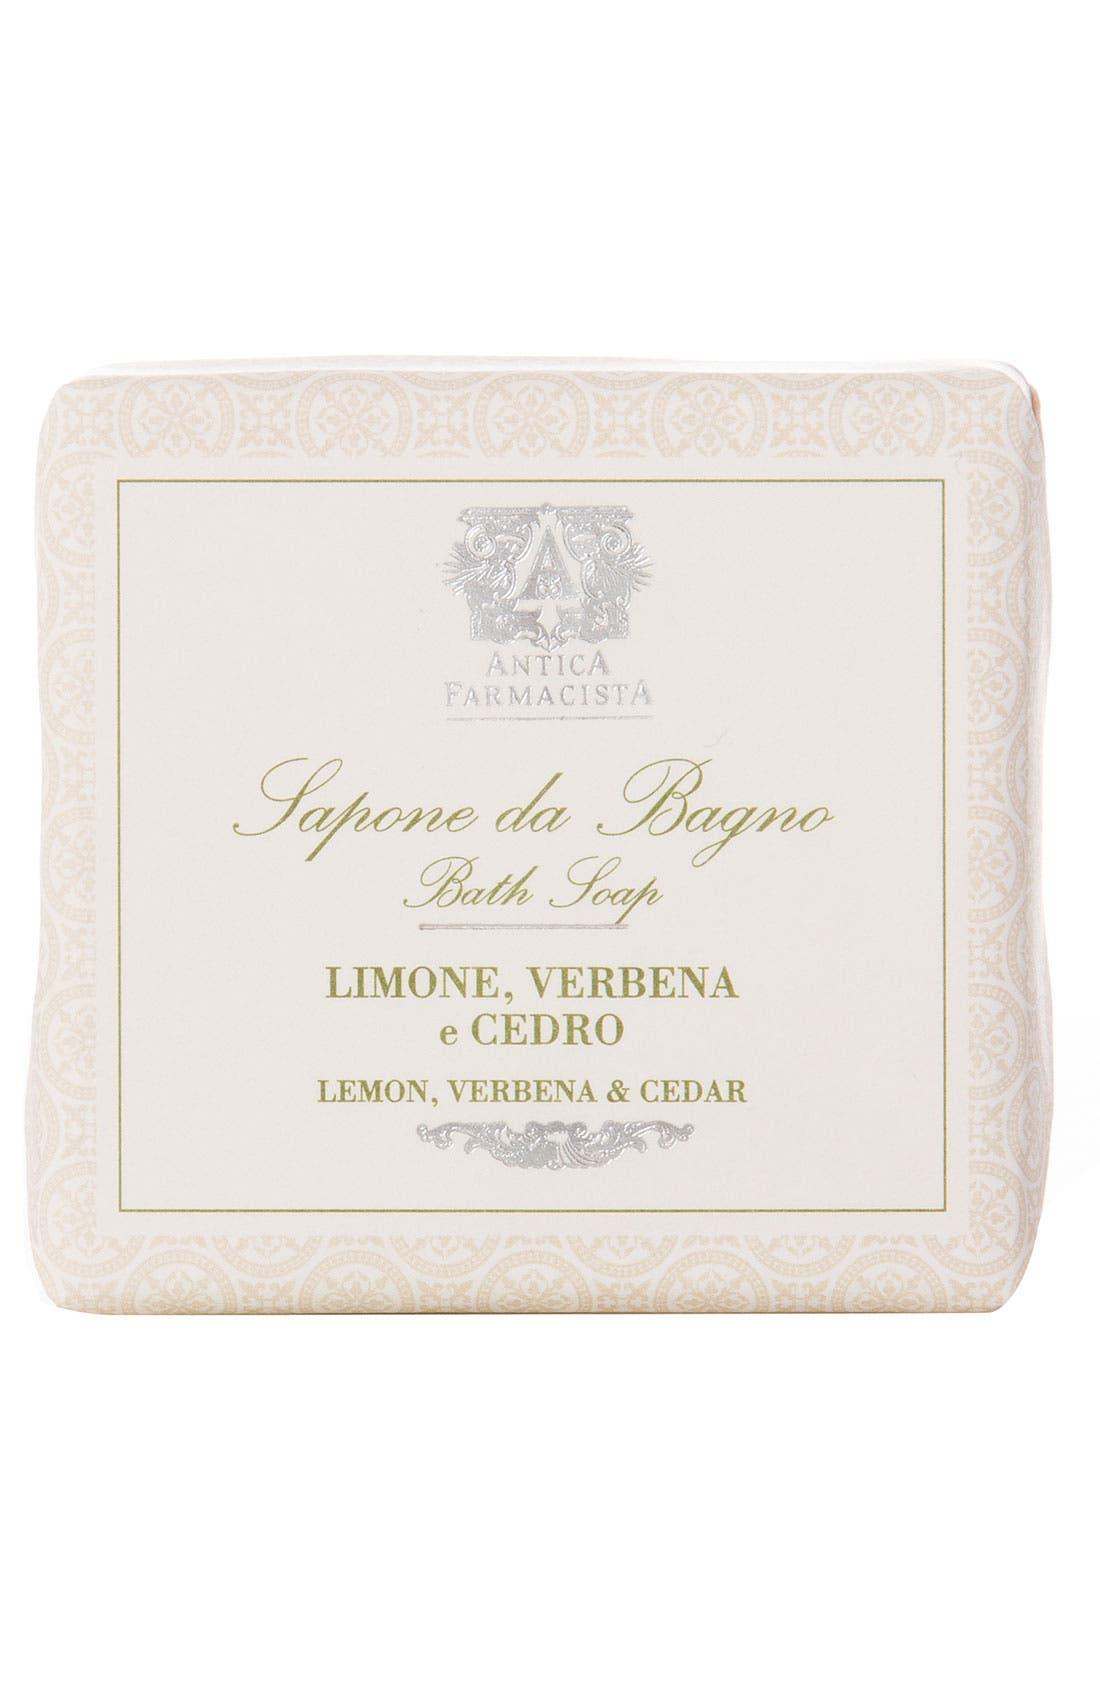 Antica Farmacista 'Lemon, Verbena & Cedar' Bar Soap